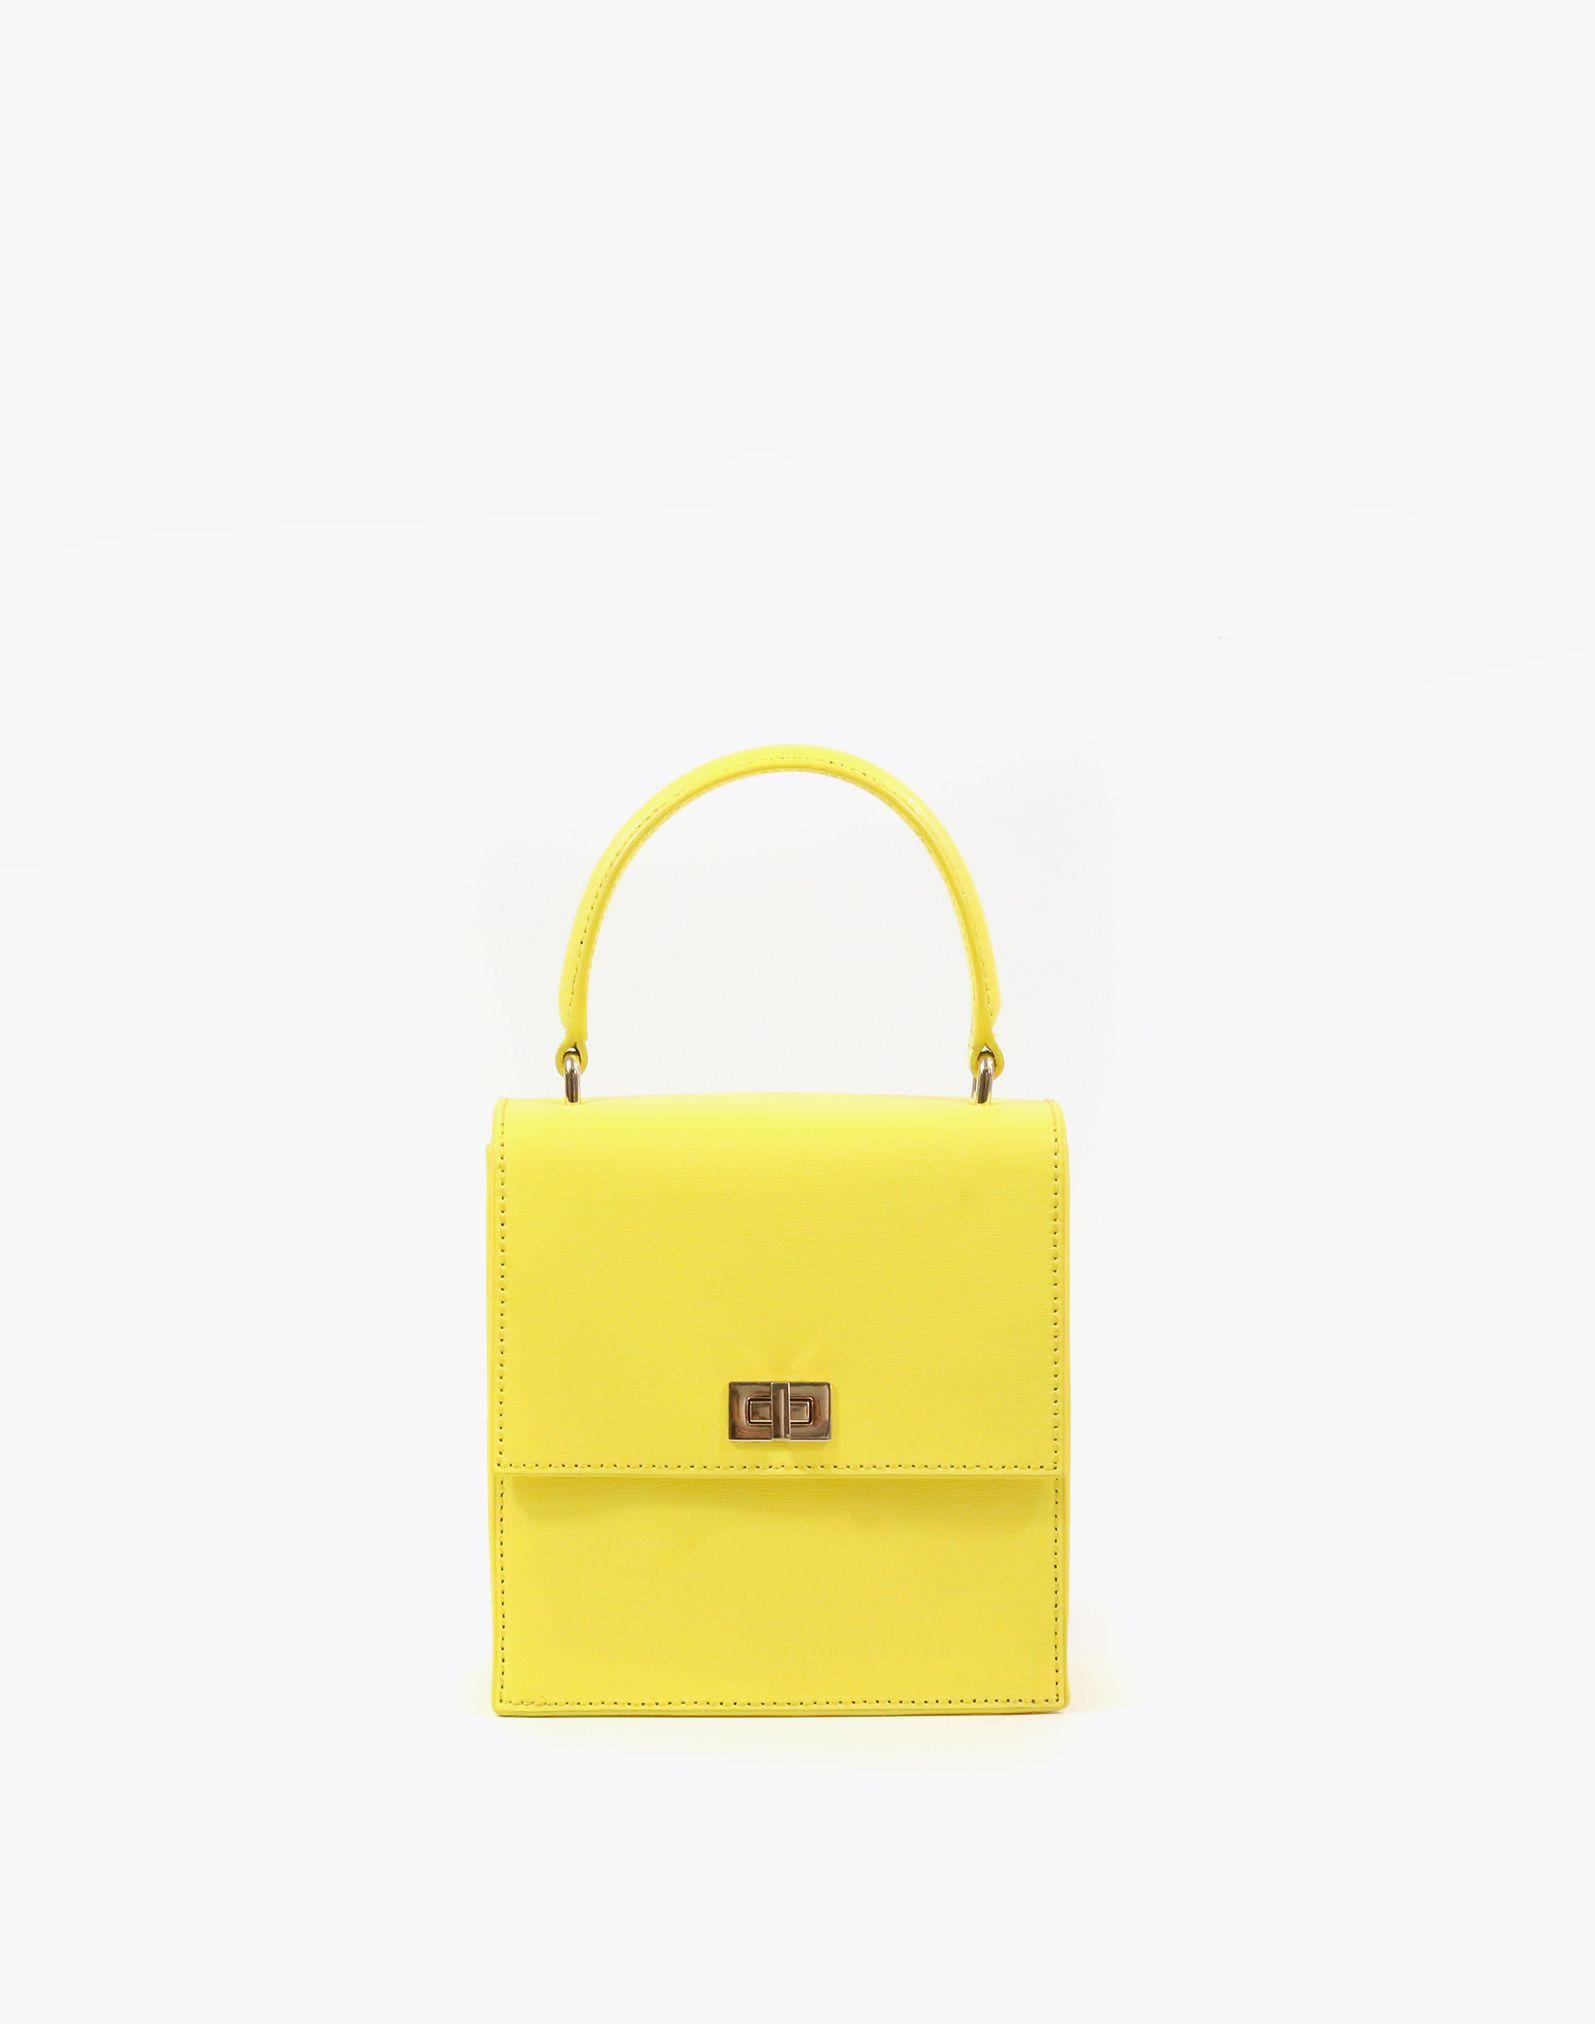 4adff042744e No. 19 The Mini Lady Bag Saffiano - Neely   Chloe